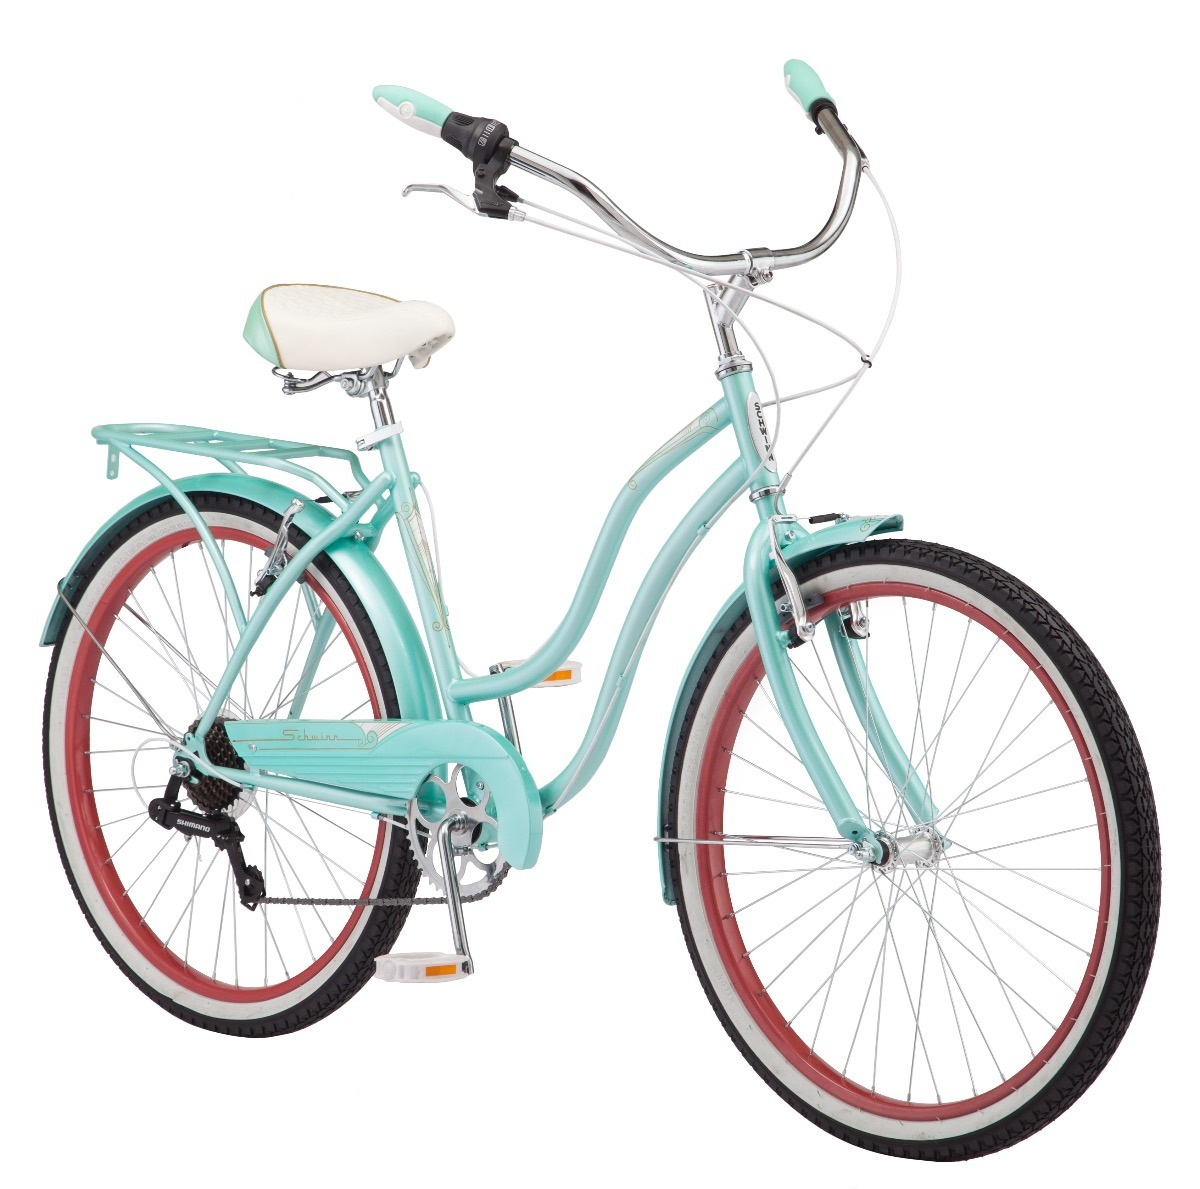 b24c121c400 Bicicleta Schwinn Urbana Miramar Rodada 26 - Dama Oferta ...